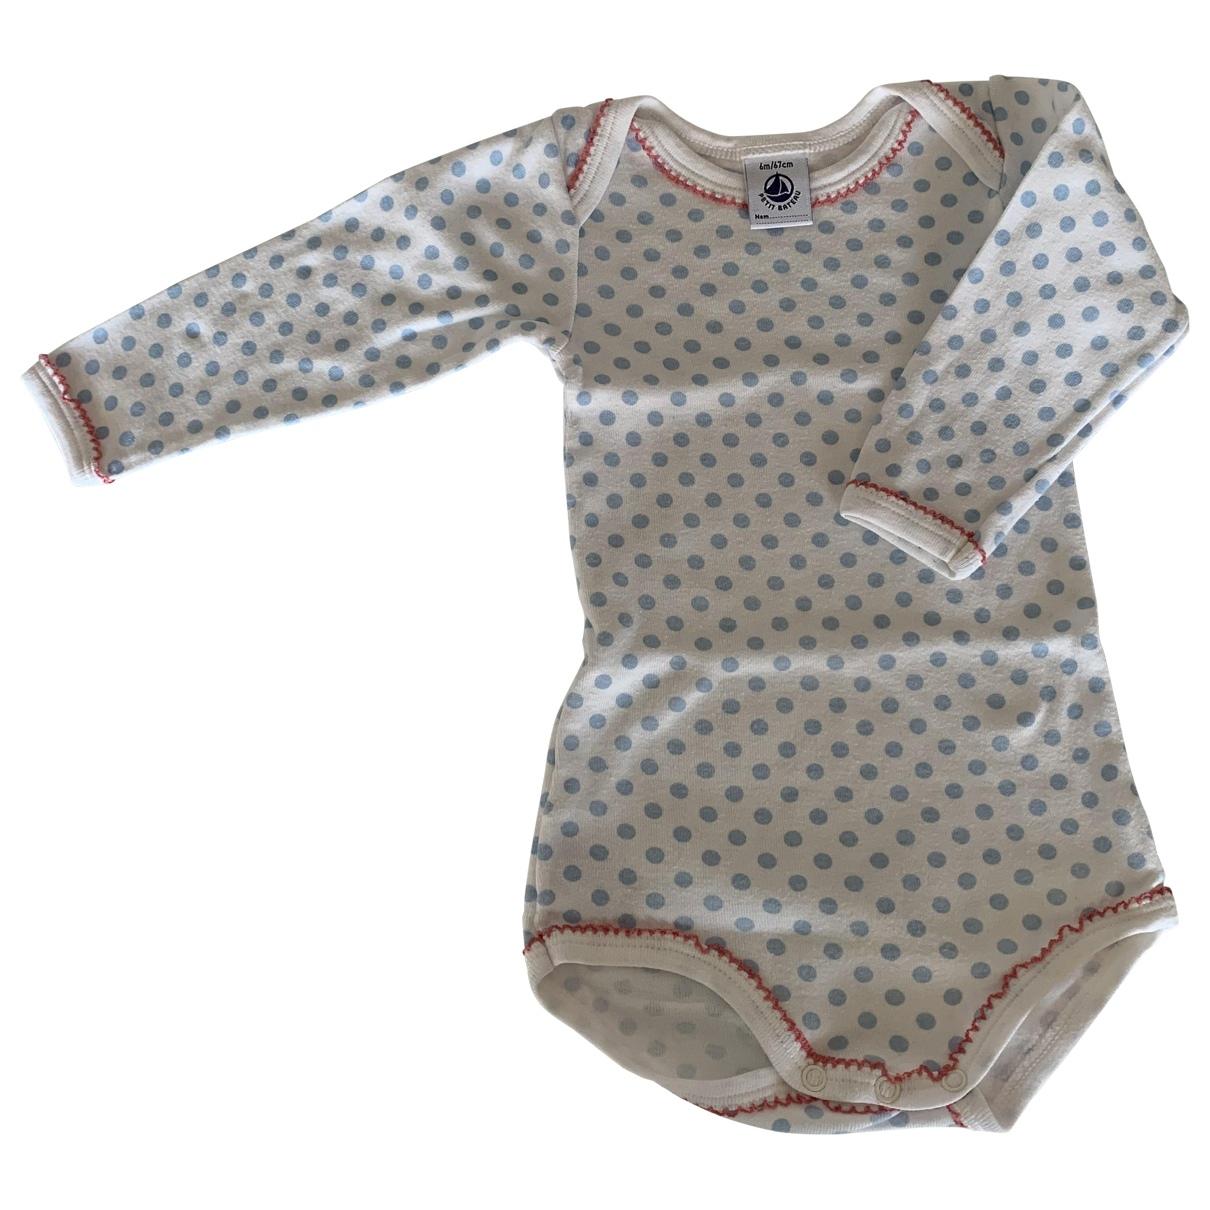 Petit Bateau N Cotton  top for Kids 6 months - up to 67cm FR